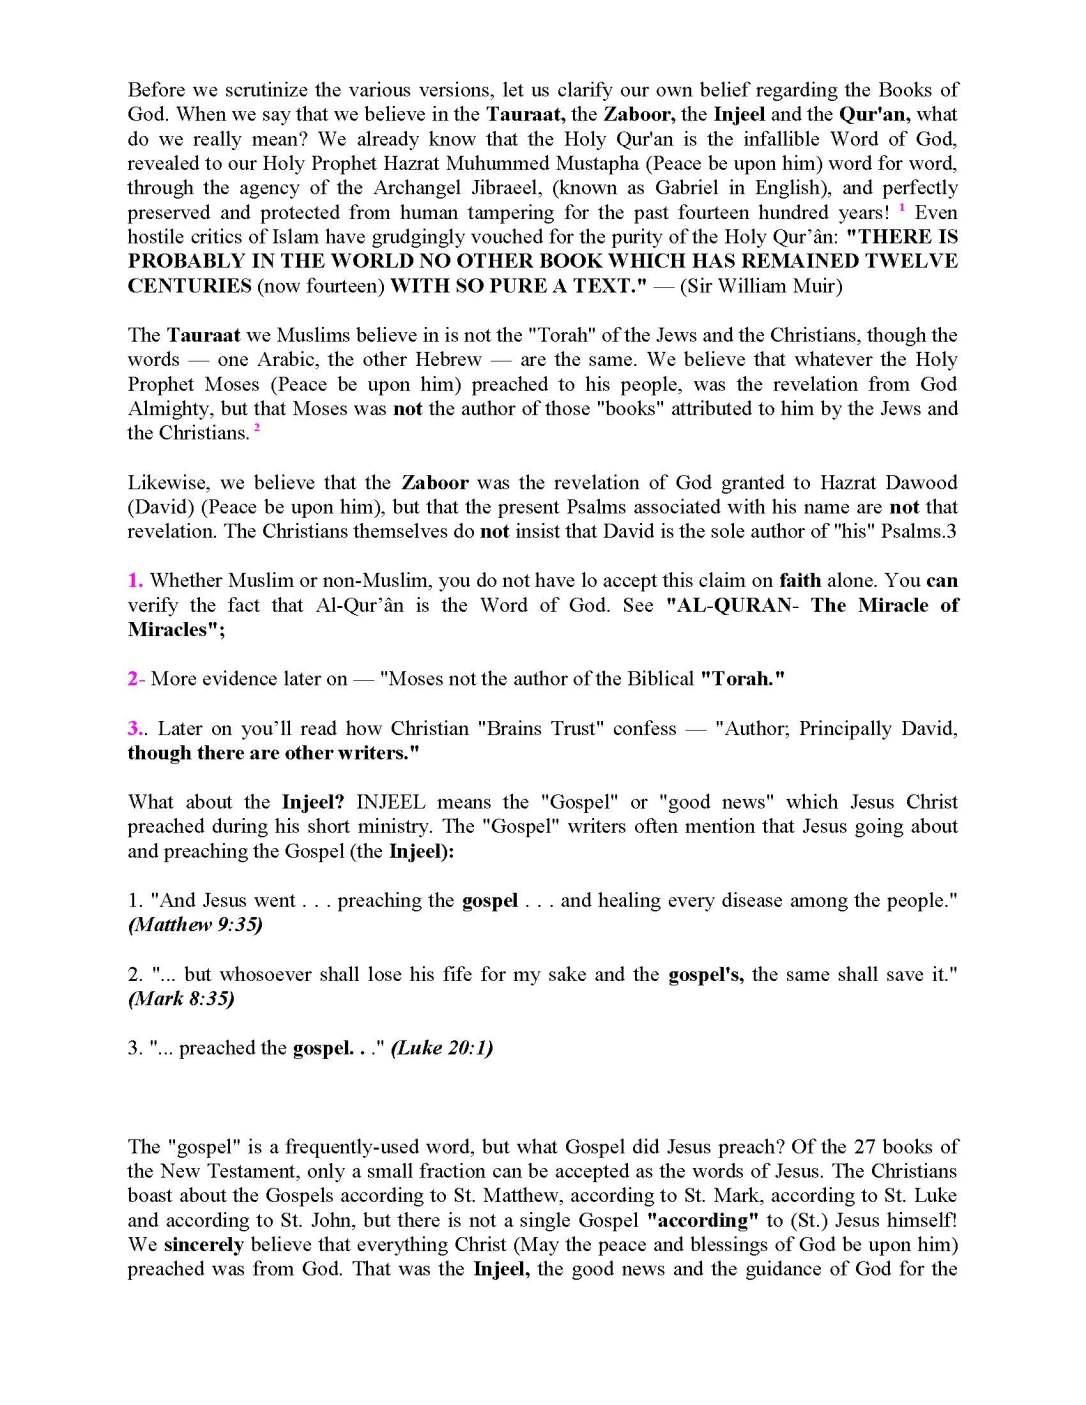 Is The Bible Gods Word [deedat]_Page_05